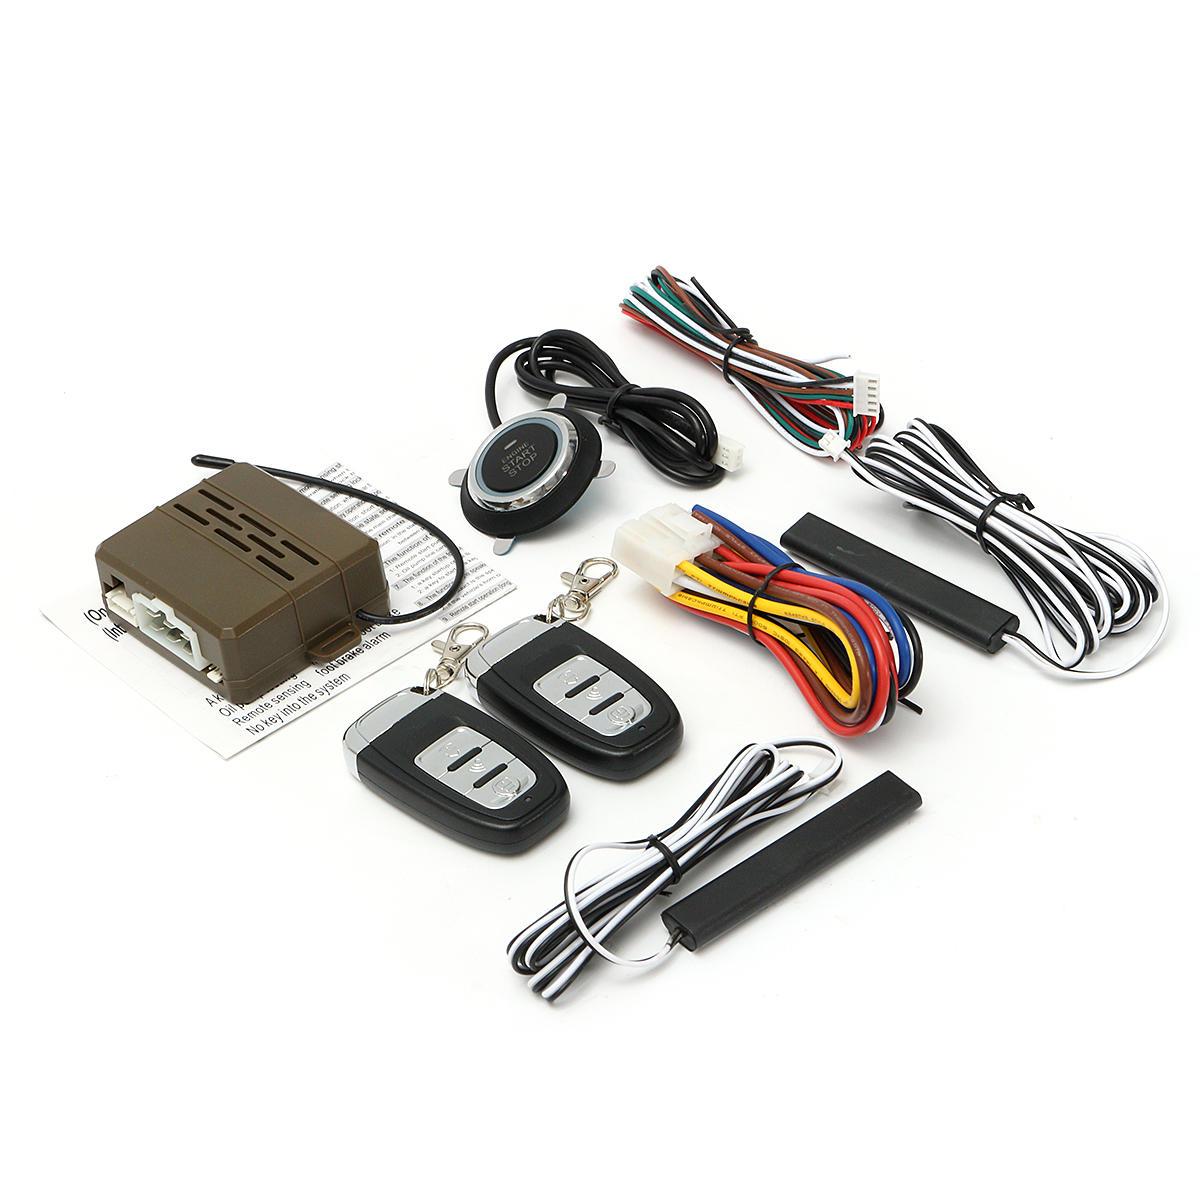 hight resolution of 8pcs car alarm start engine system pke keyless entry remote start push button cod